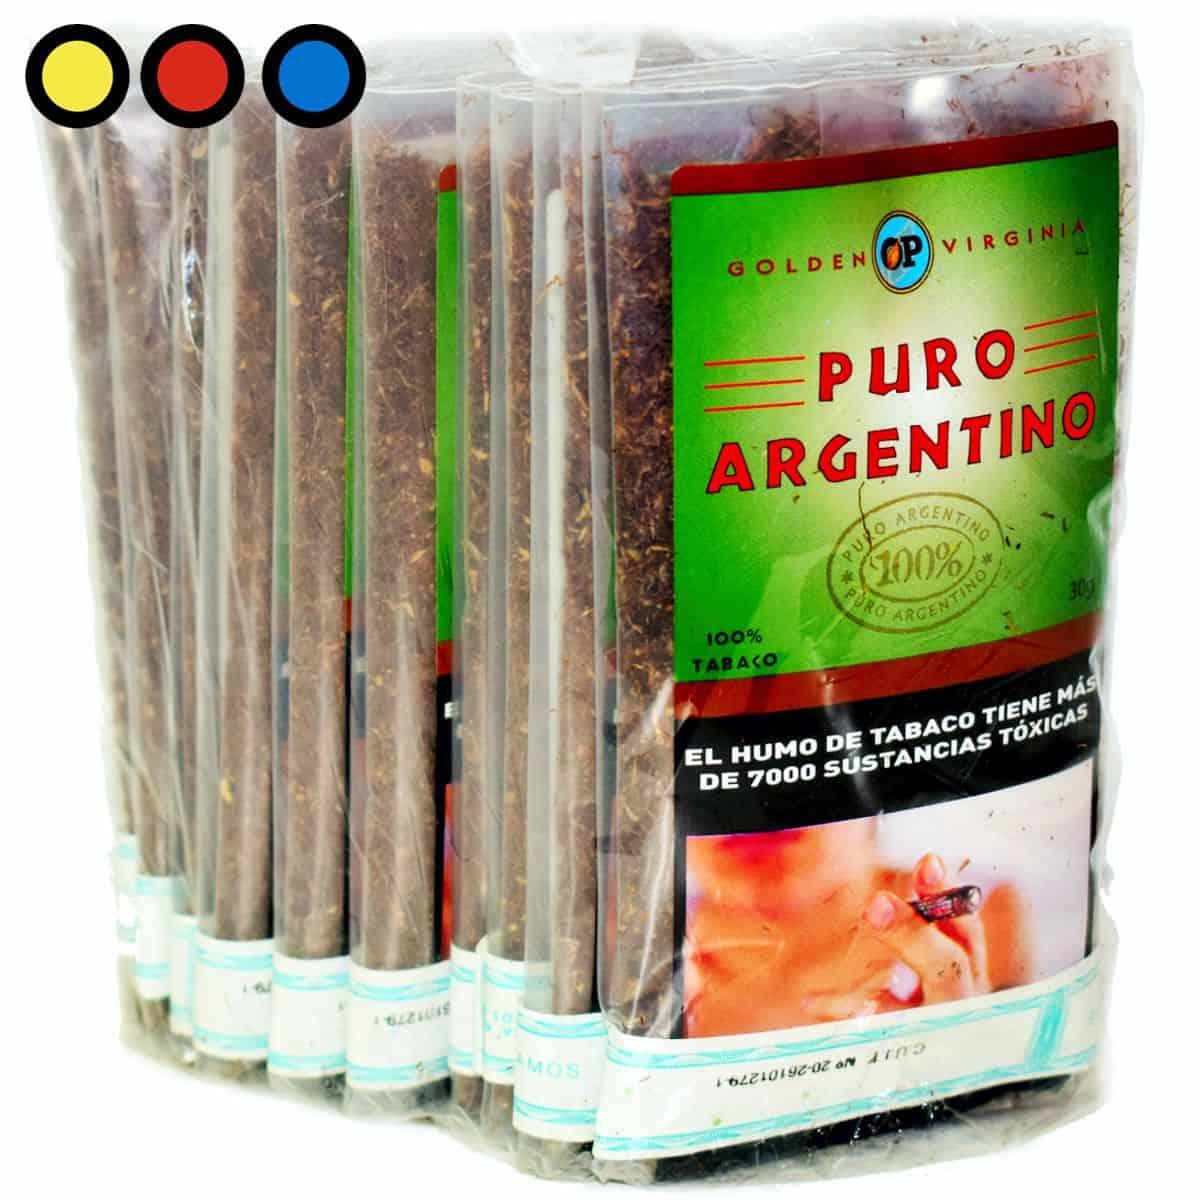 puro argentino virginia 30 gramos